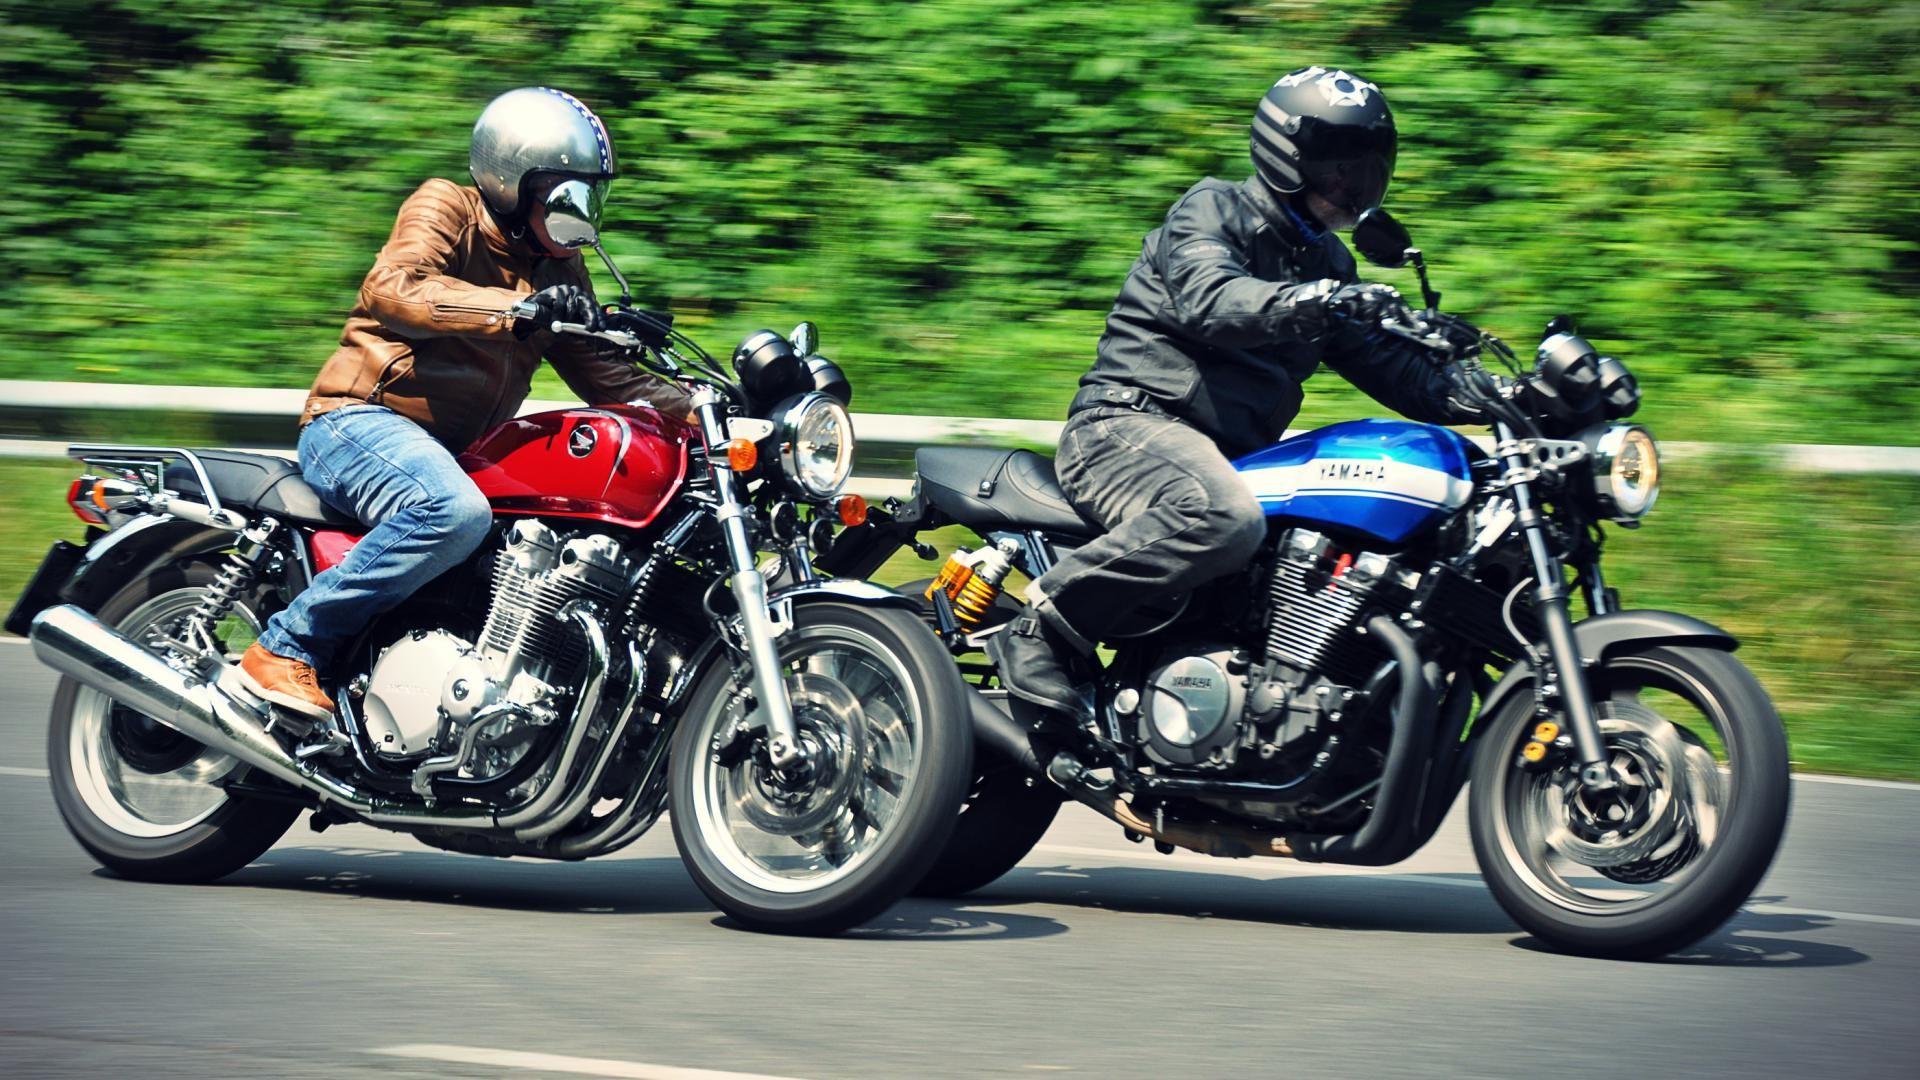 Confronto: Honda CB1100 EX vs Yamaha XJR 1300 2015